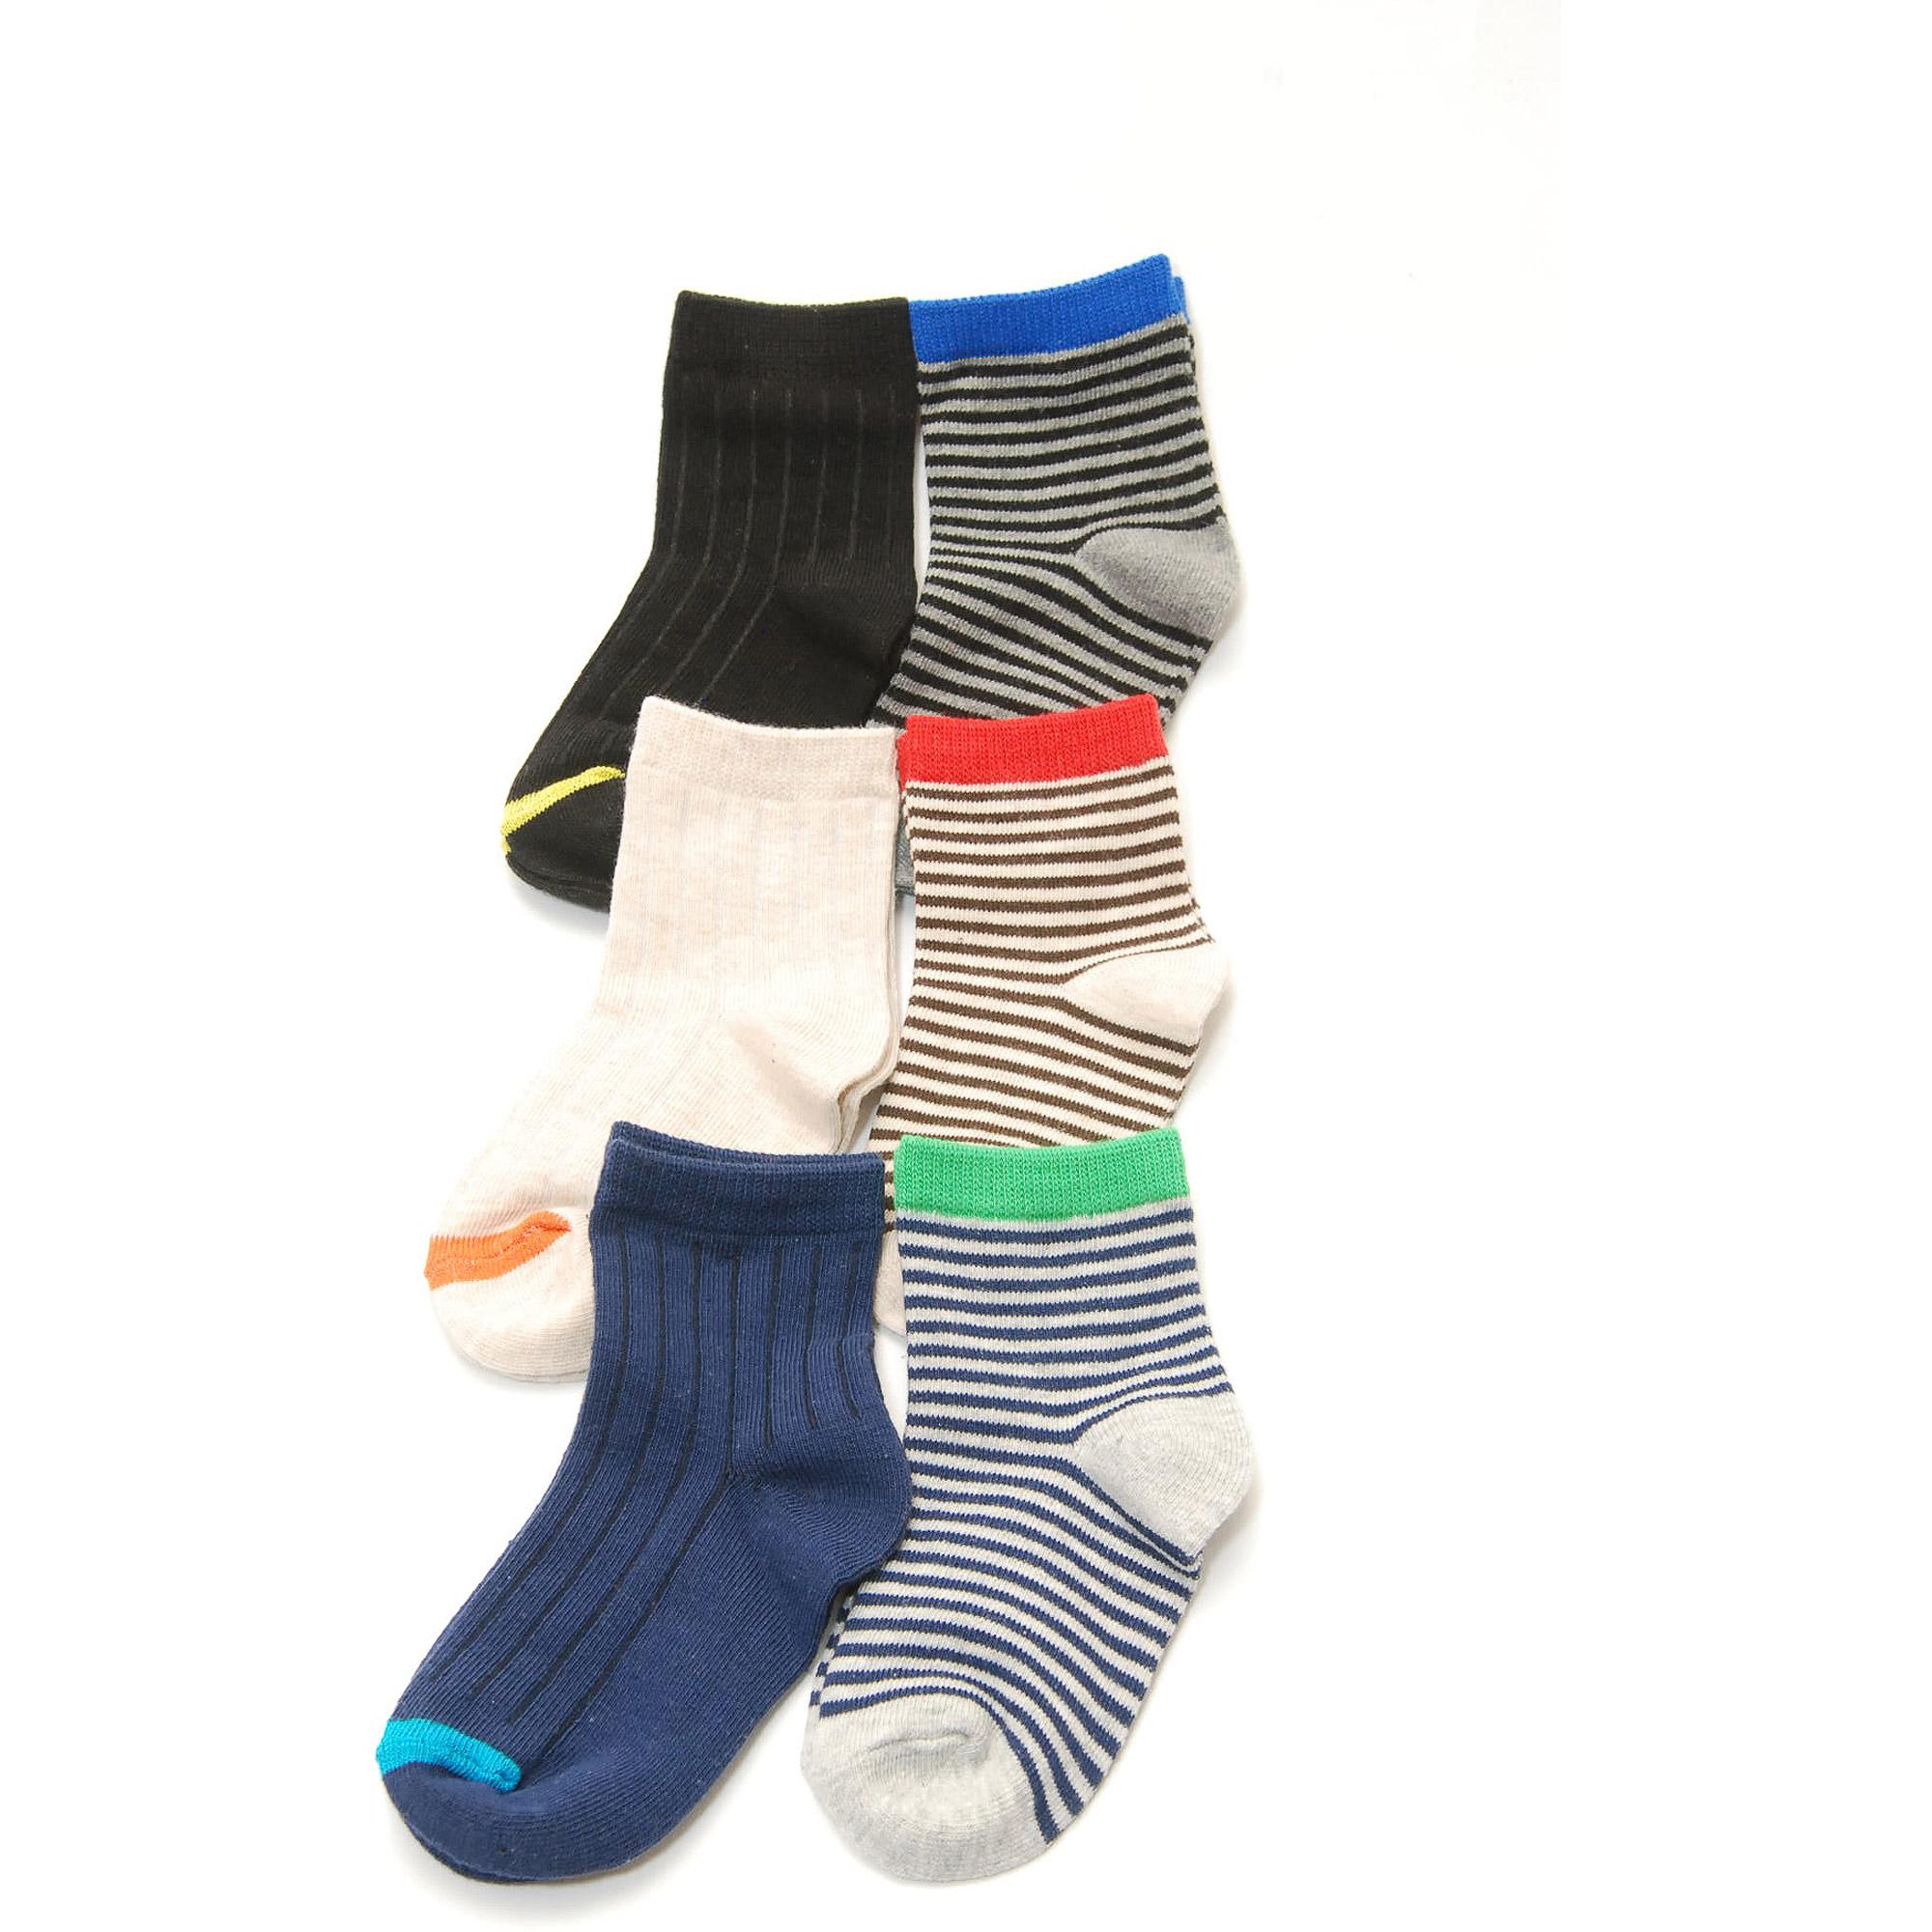 Garanimals Toddler Boy Assorted Socks, 6 Pairs